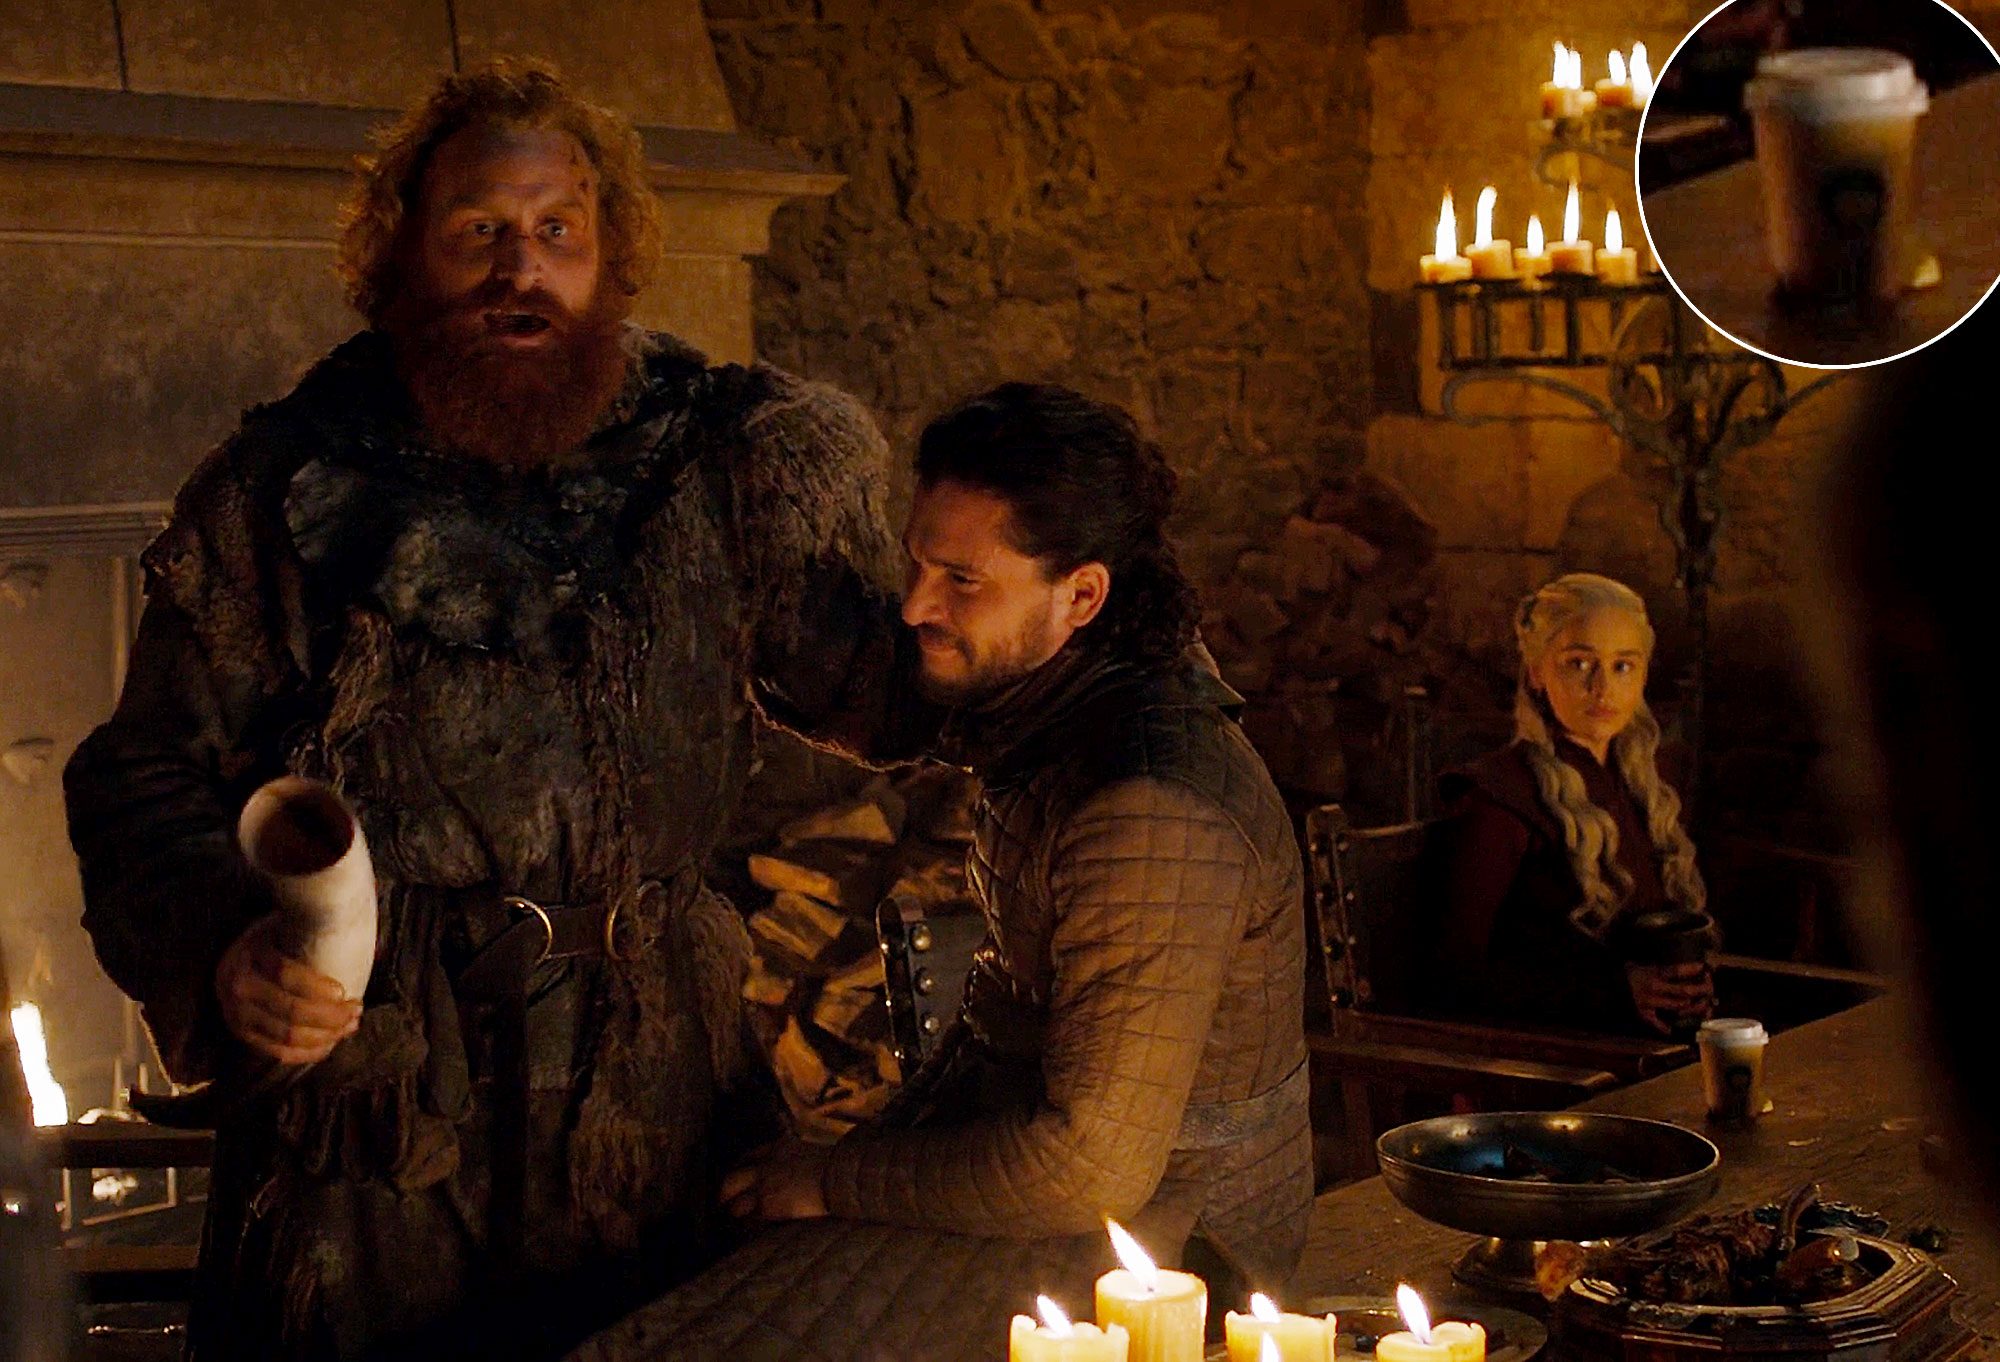 Game of Thrones Starbucks Cup On Camera Season 8 Episode 4